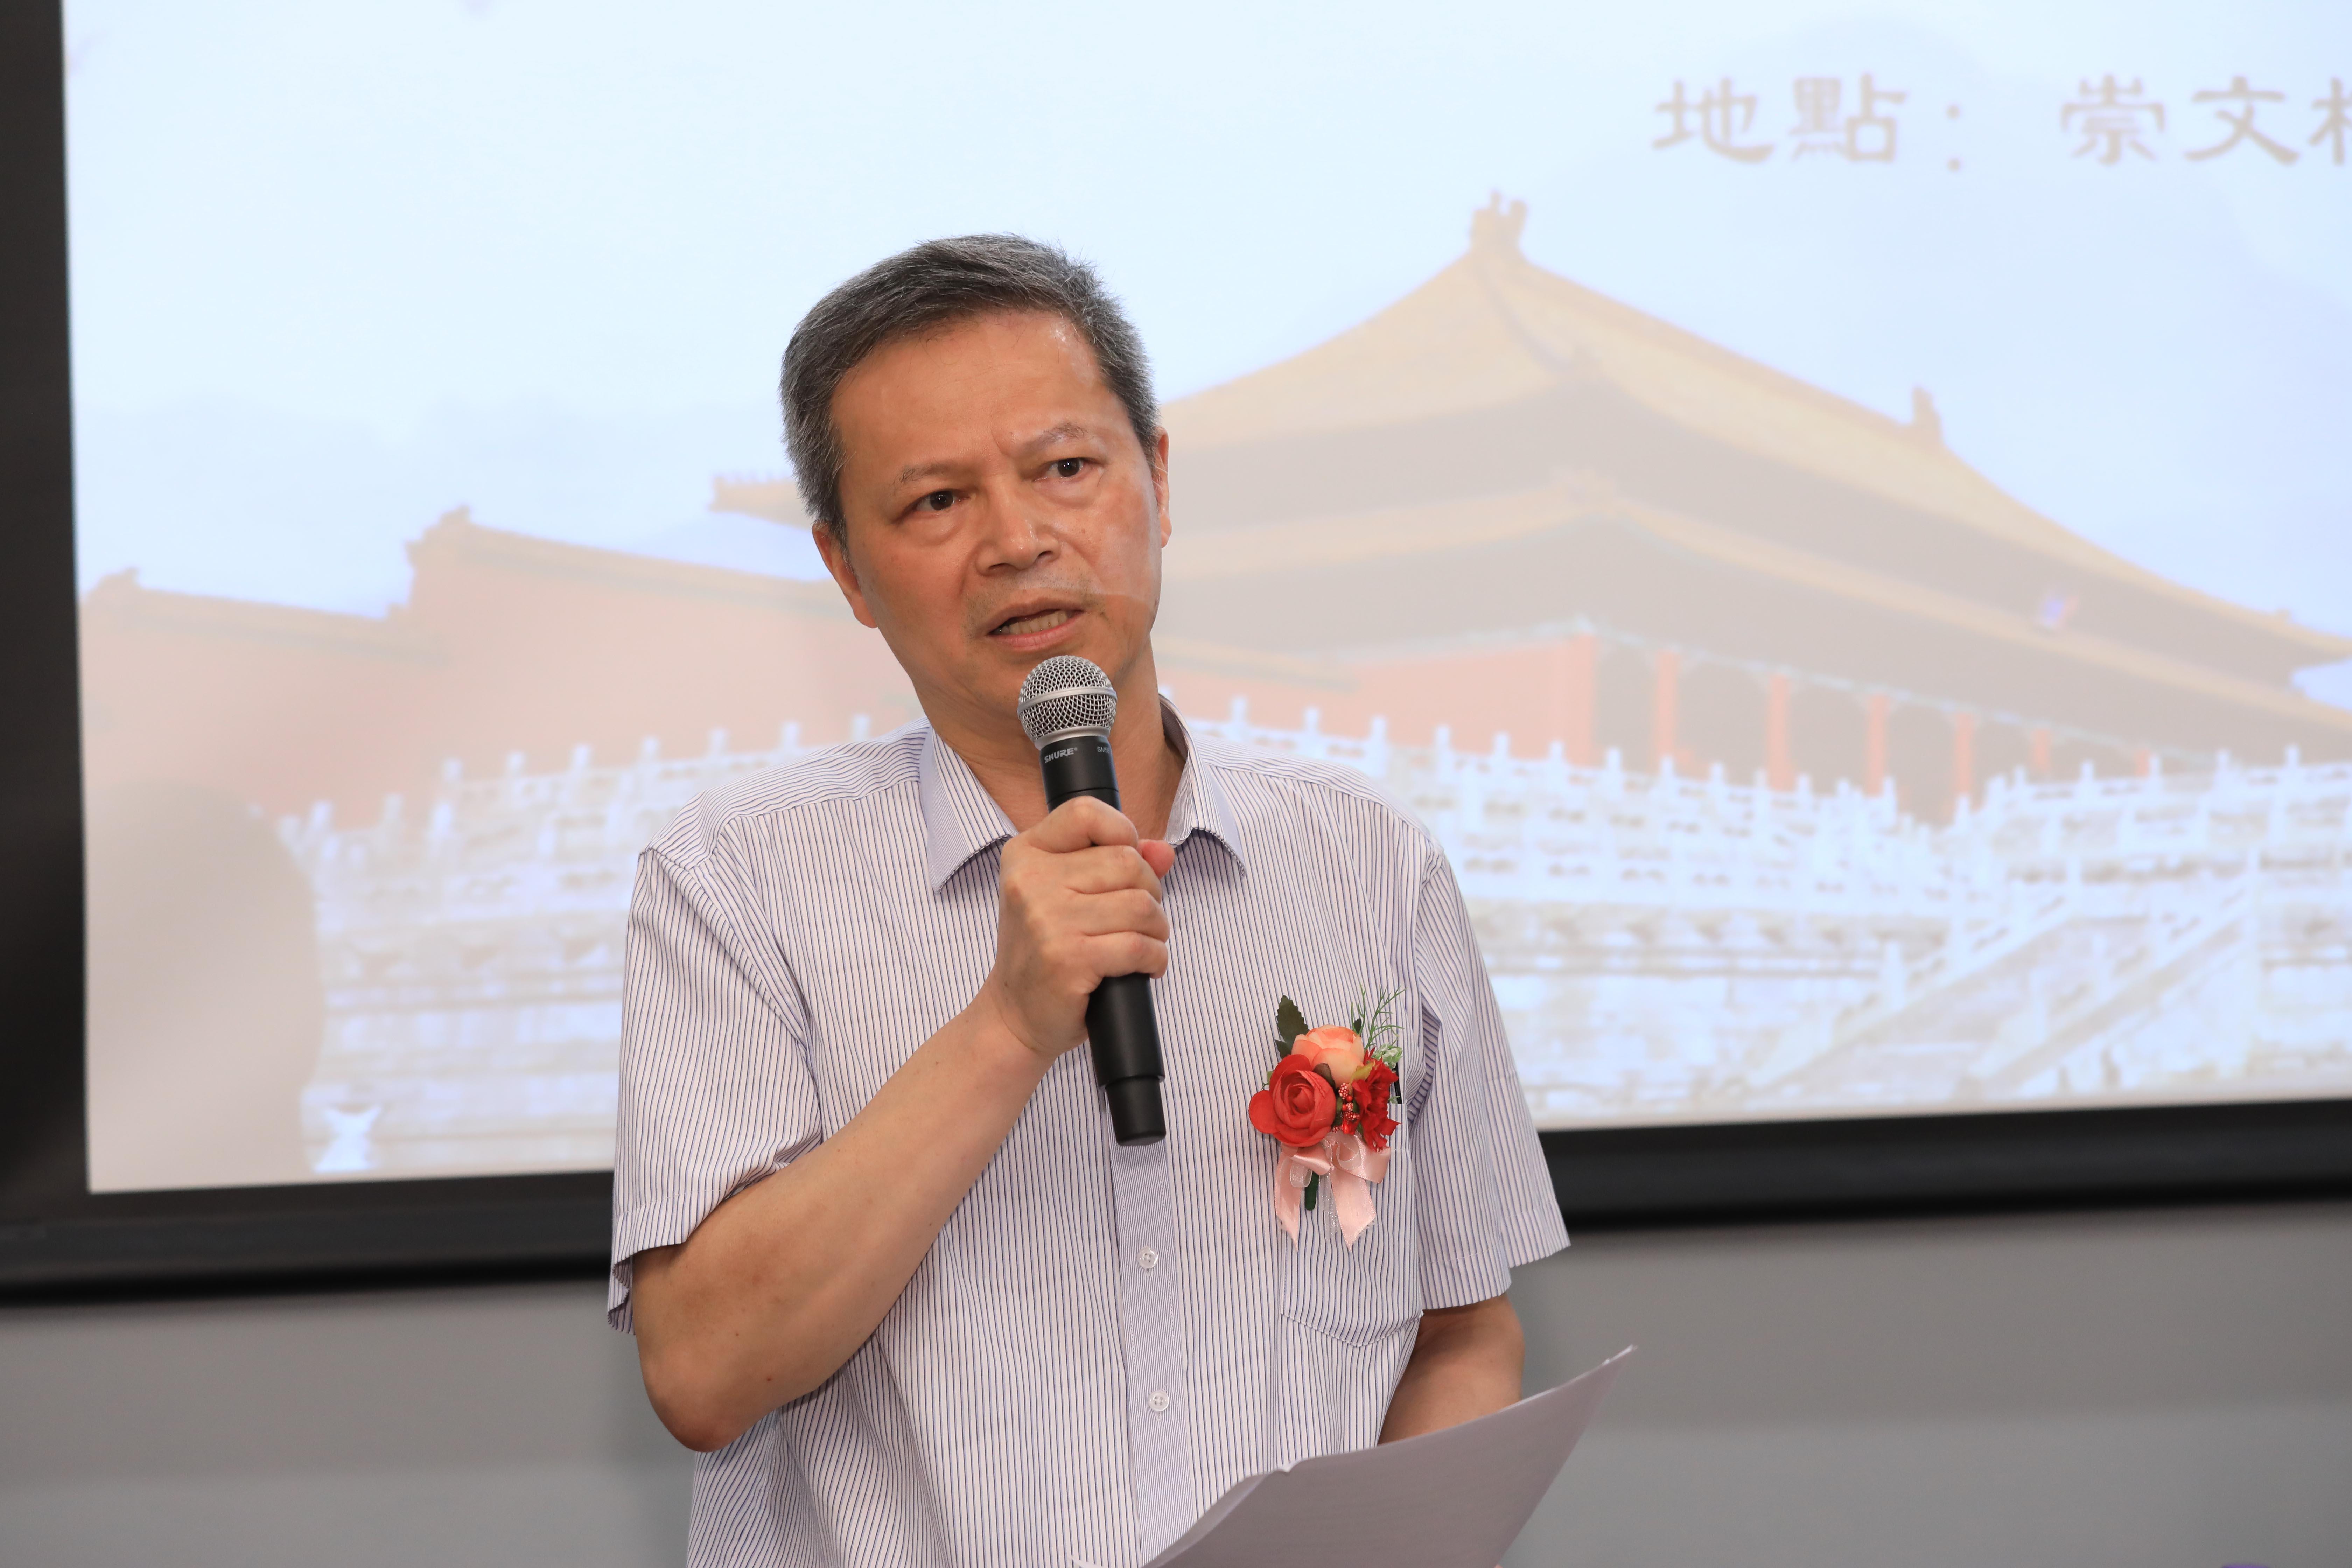 Prof Wang Di gives a keynote speech